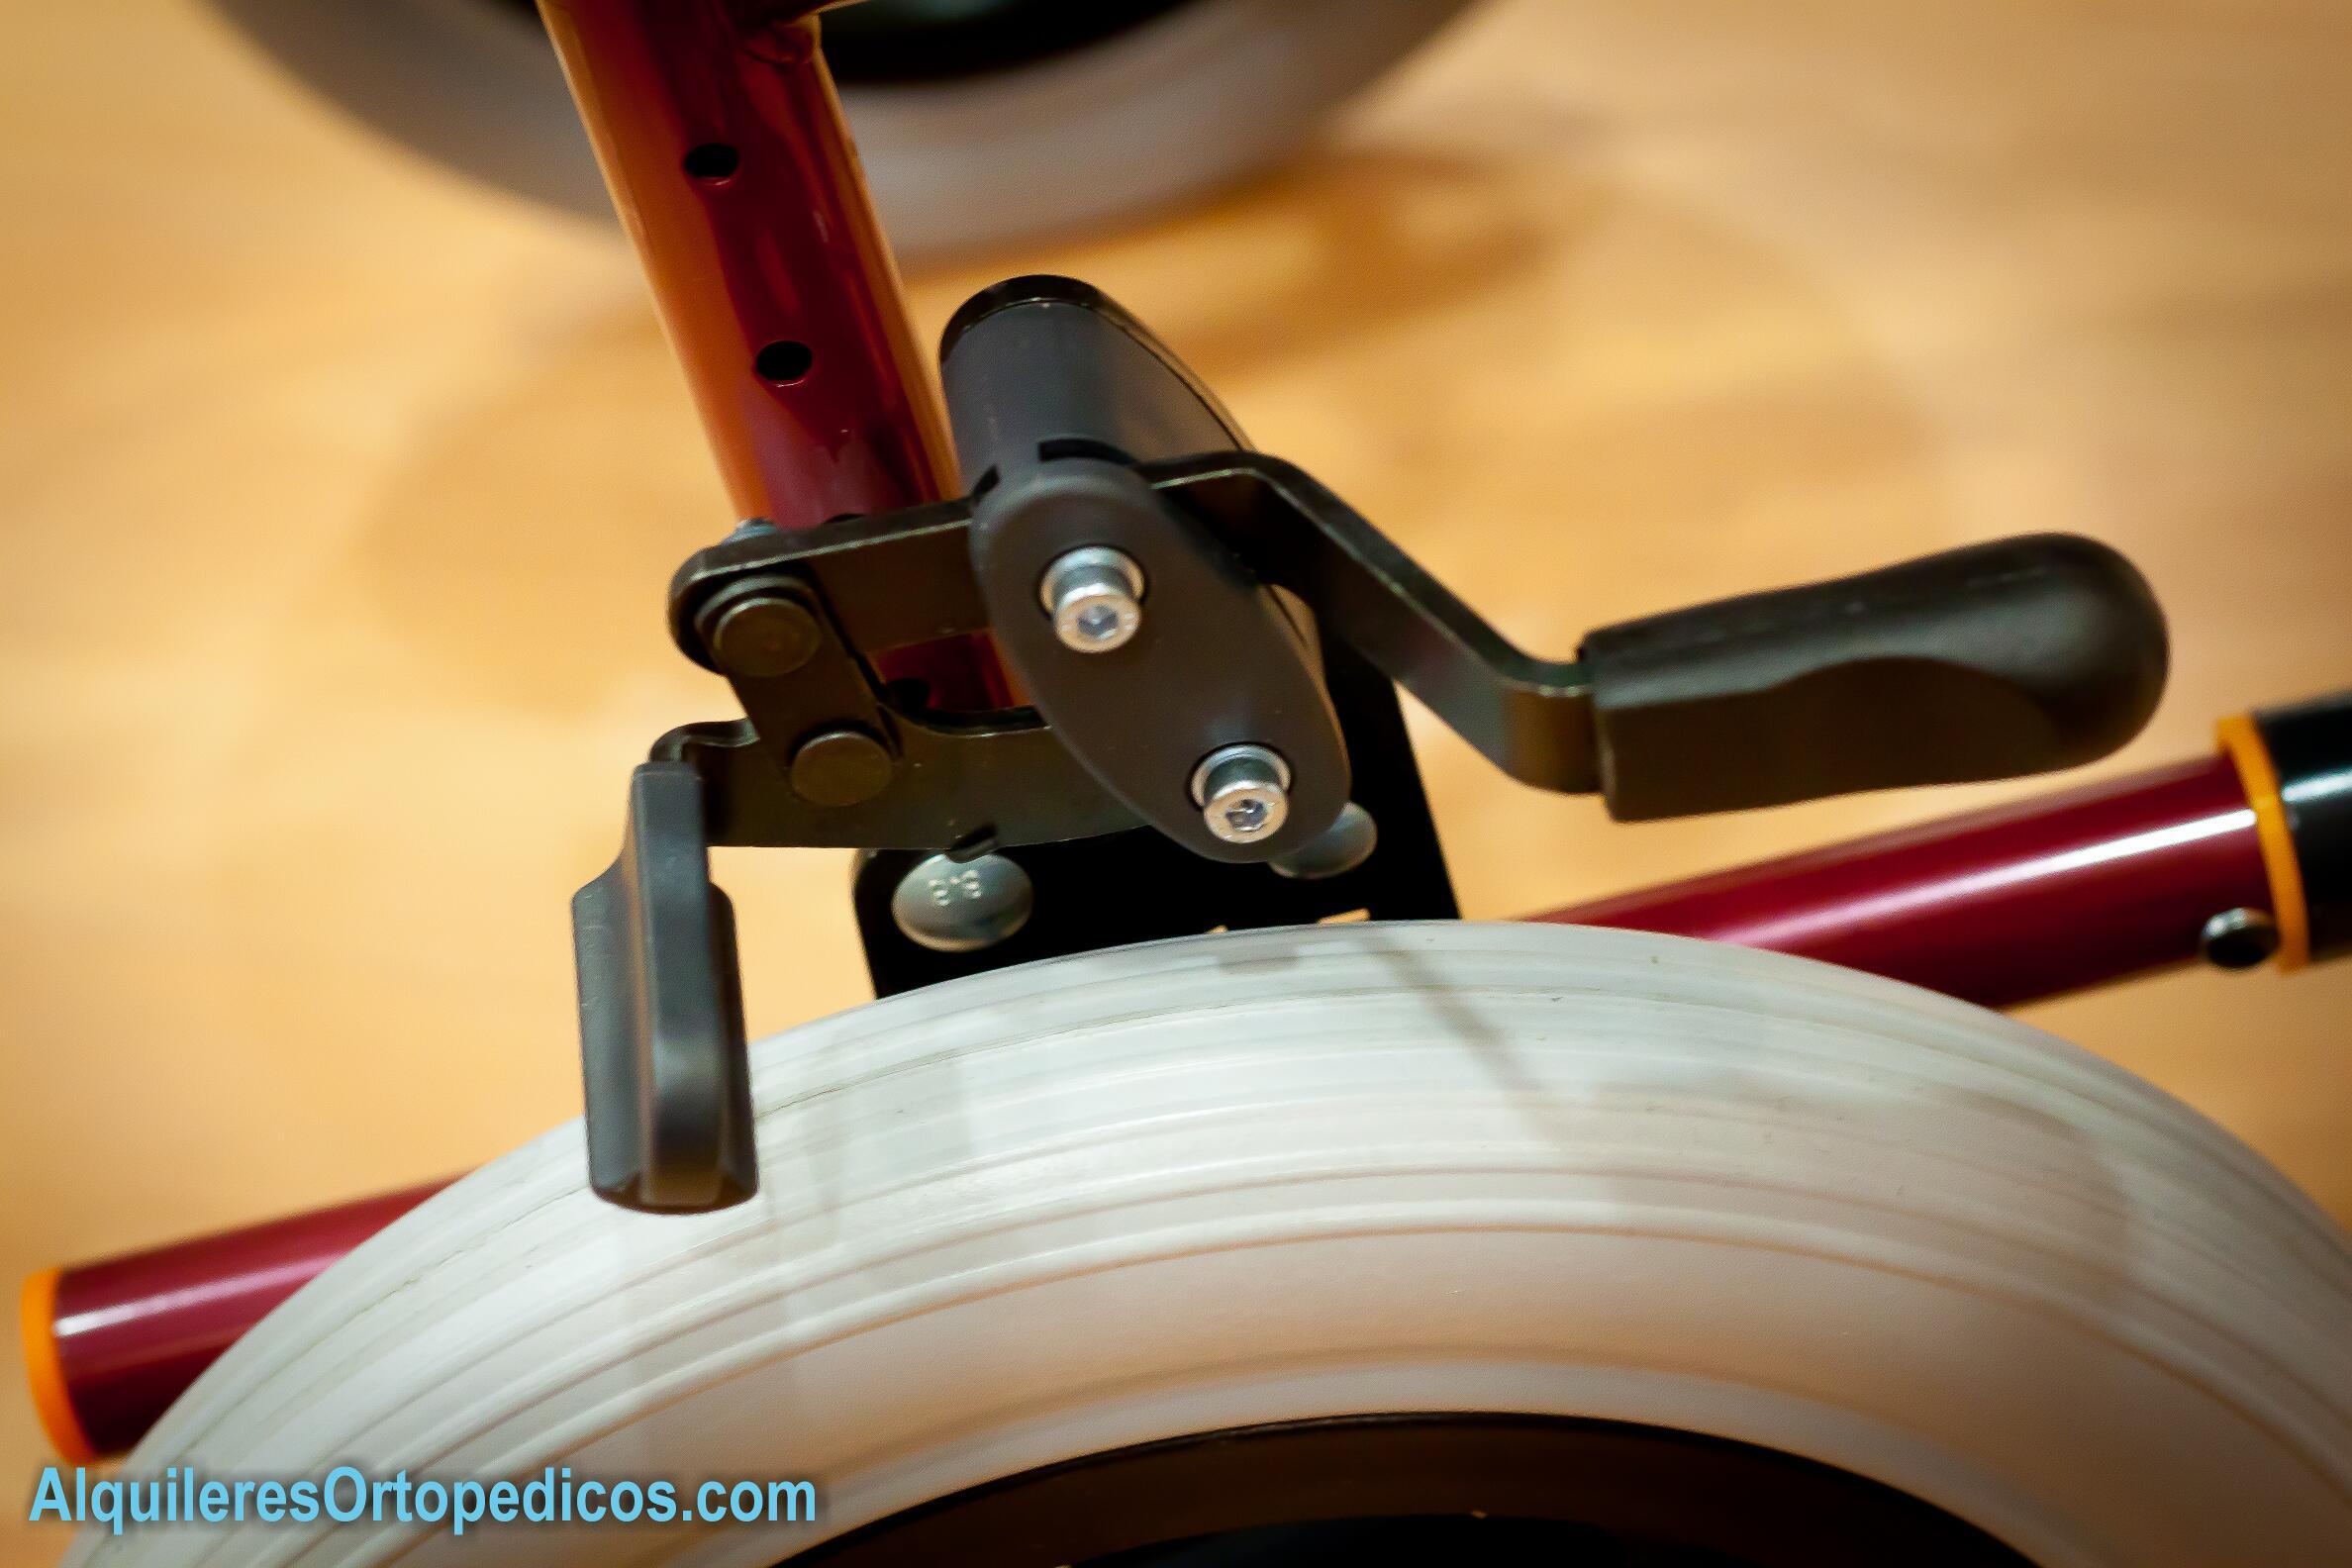 Silla de ruedas rueda peque a alquileres ortop dicos - Ruedas para sillas de ruedas ...